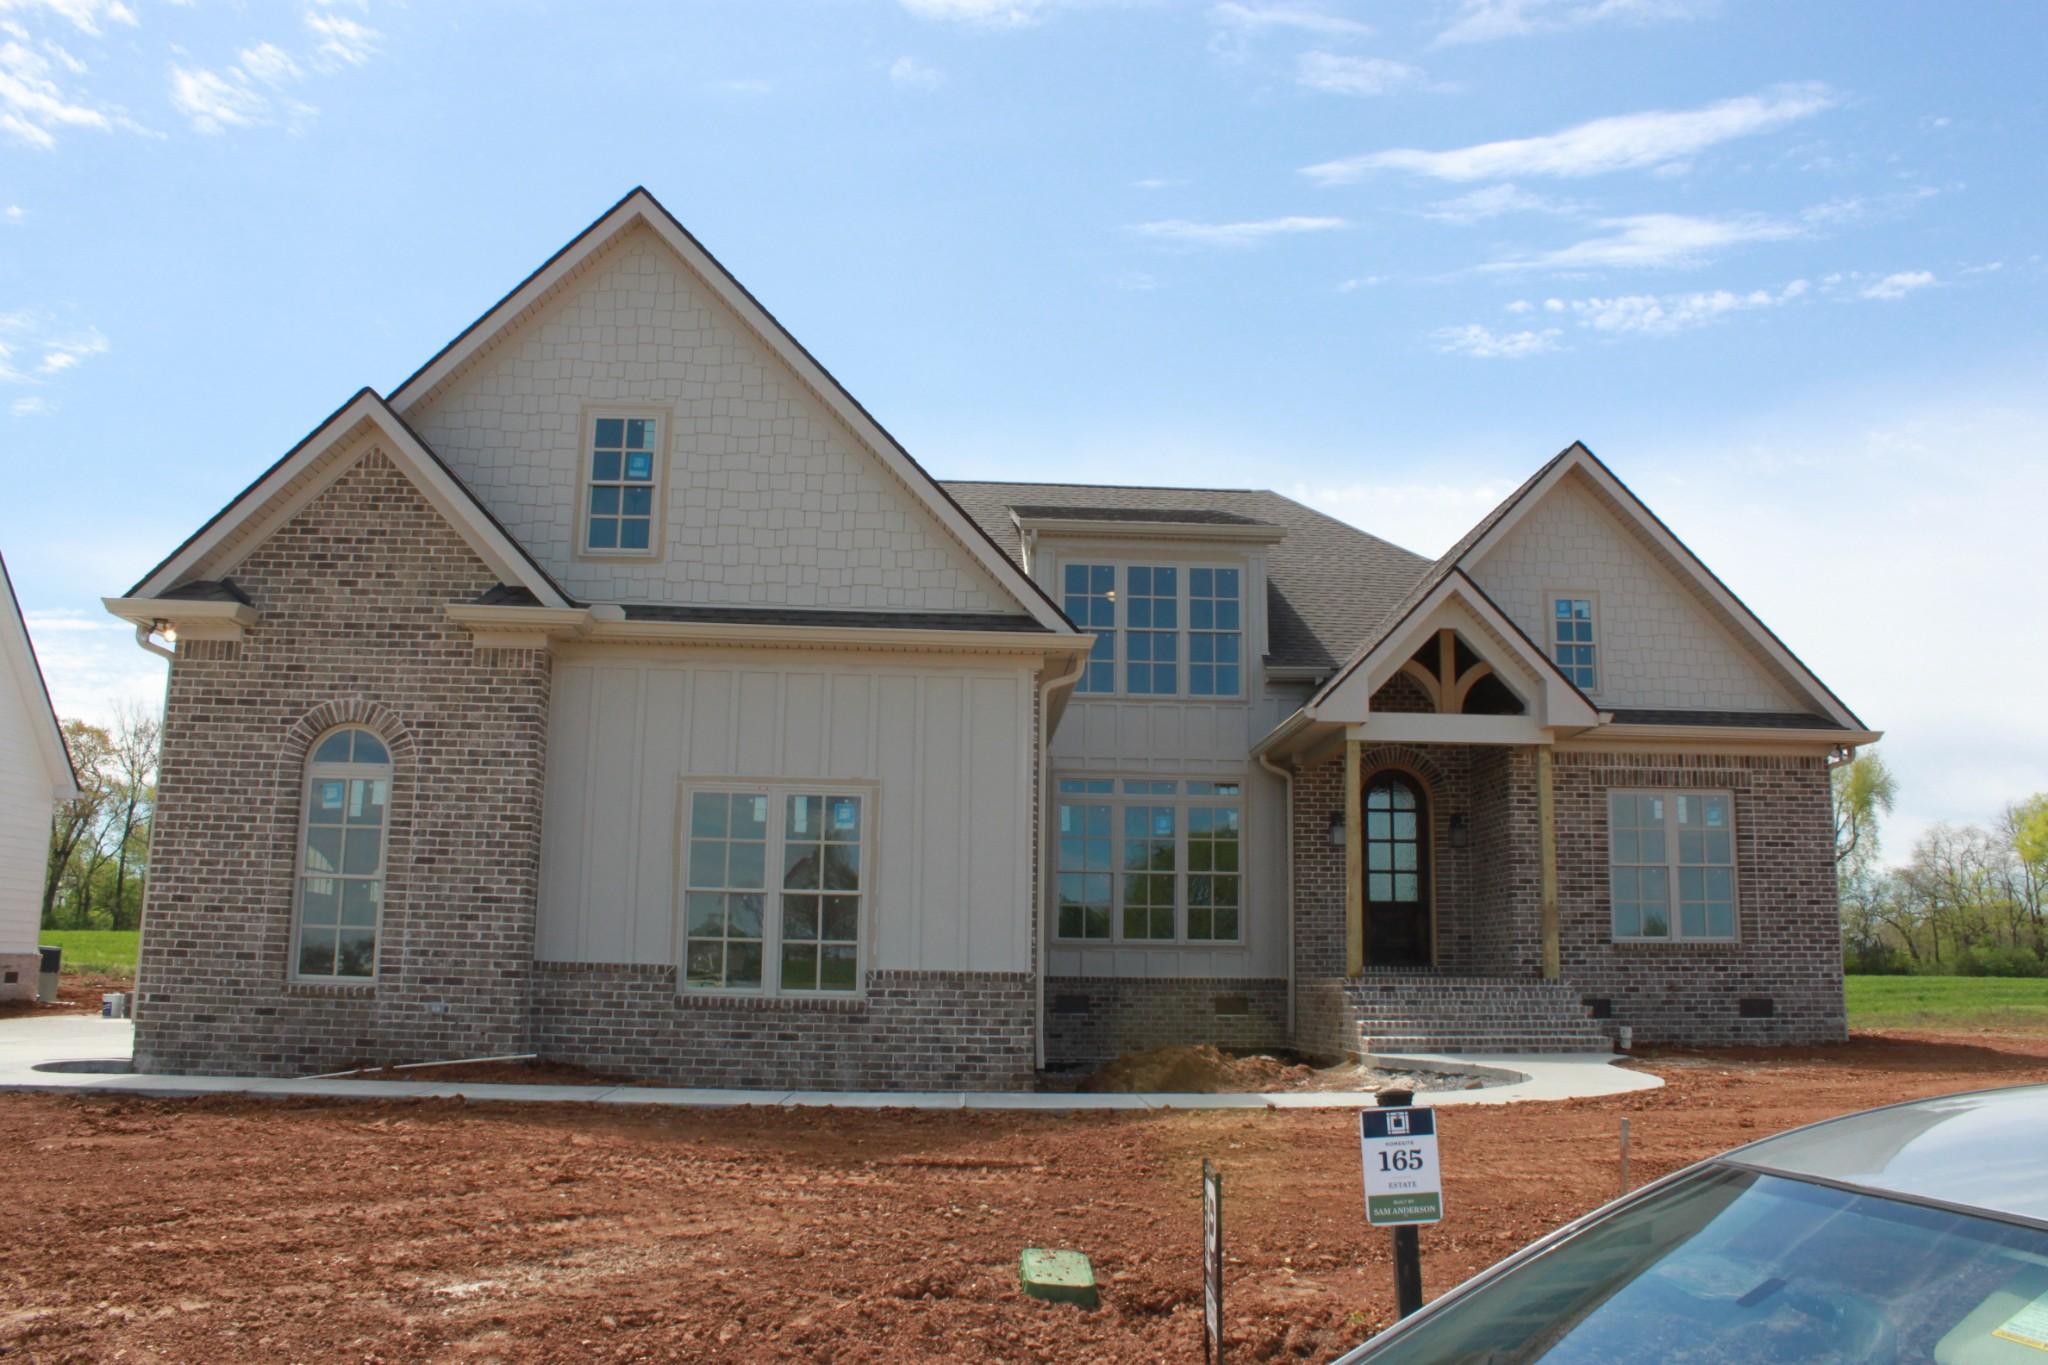 5623 Bridgemore Blvd., Murfreesboro, TN 37128 - Murfreesboro, TN real estate listing